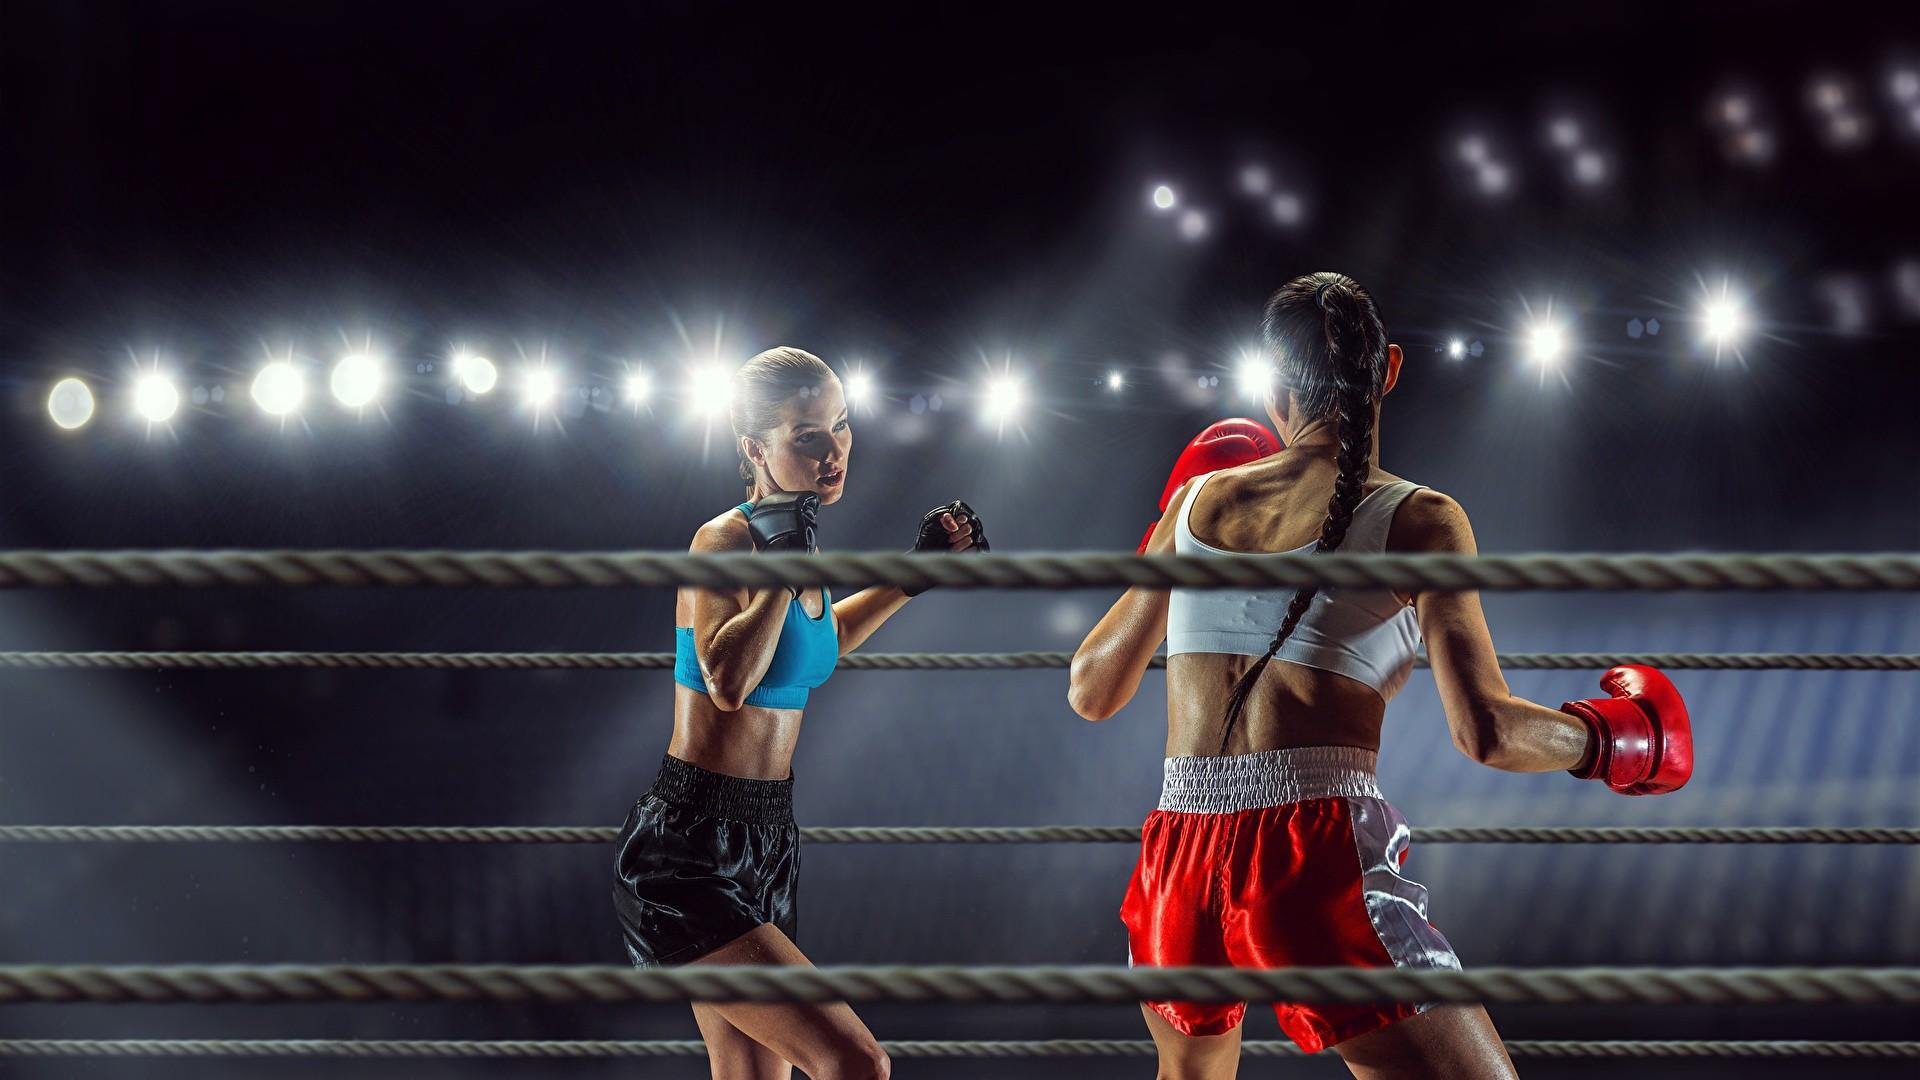 SPORTS girls-boxing-fight-ring wallpaper     1081806   WallpaperUP